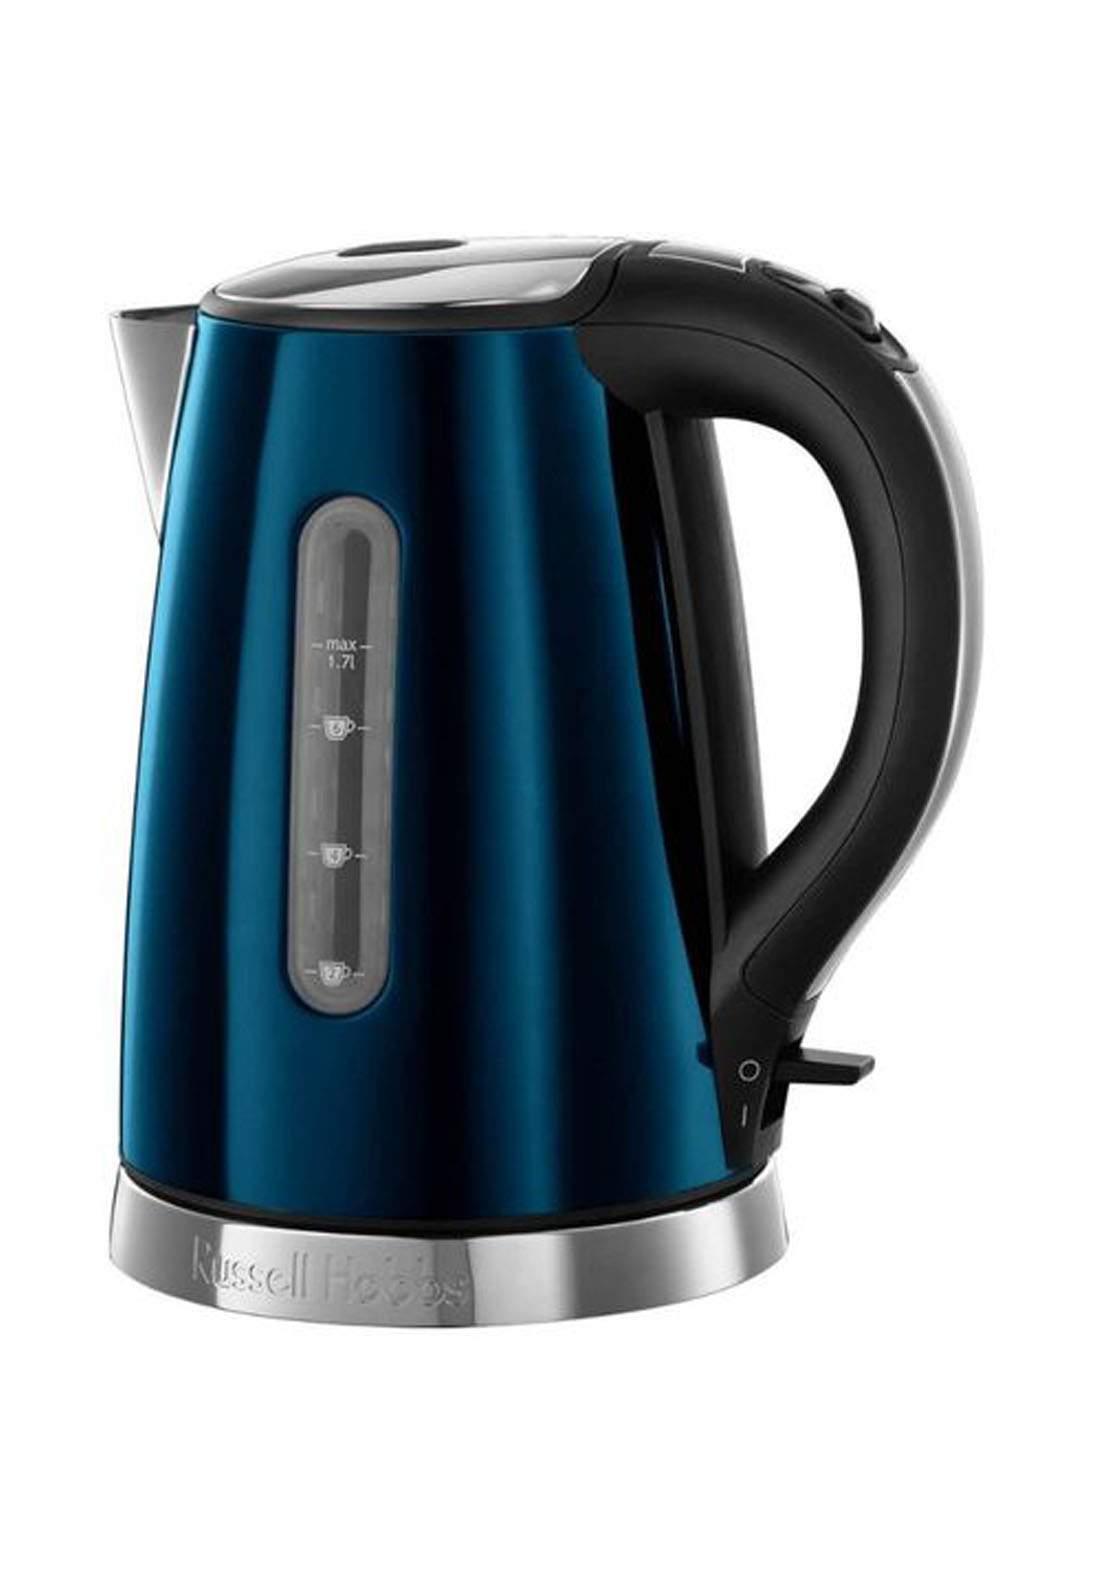 Russell hobbs 21770 Electrical kettle  غلاية